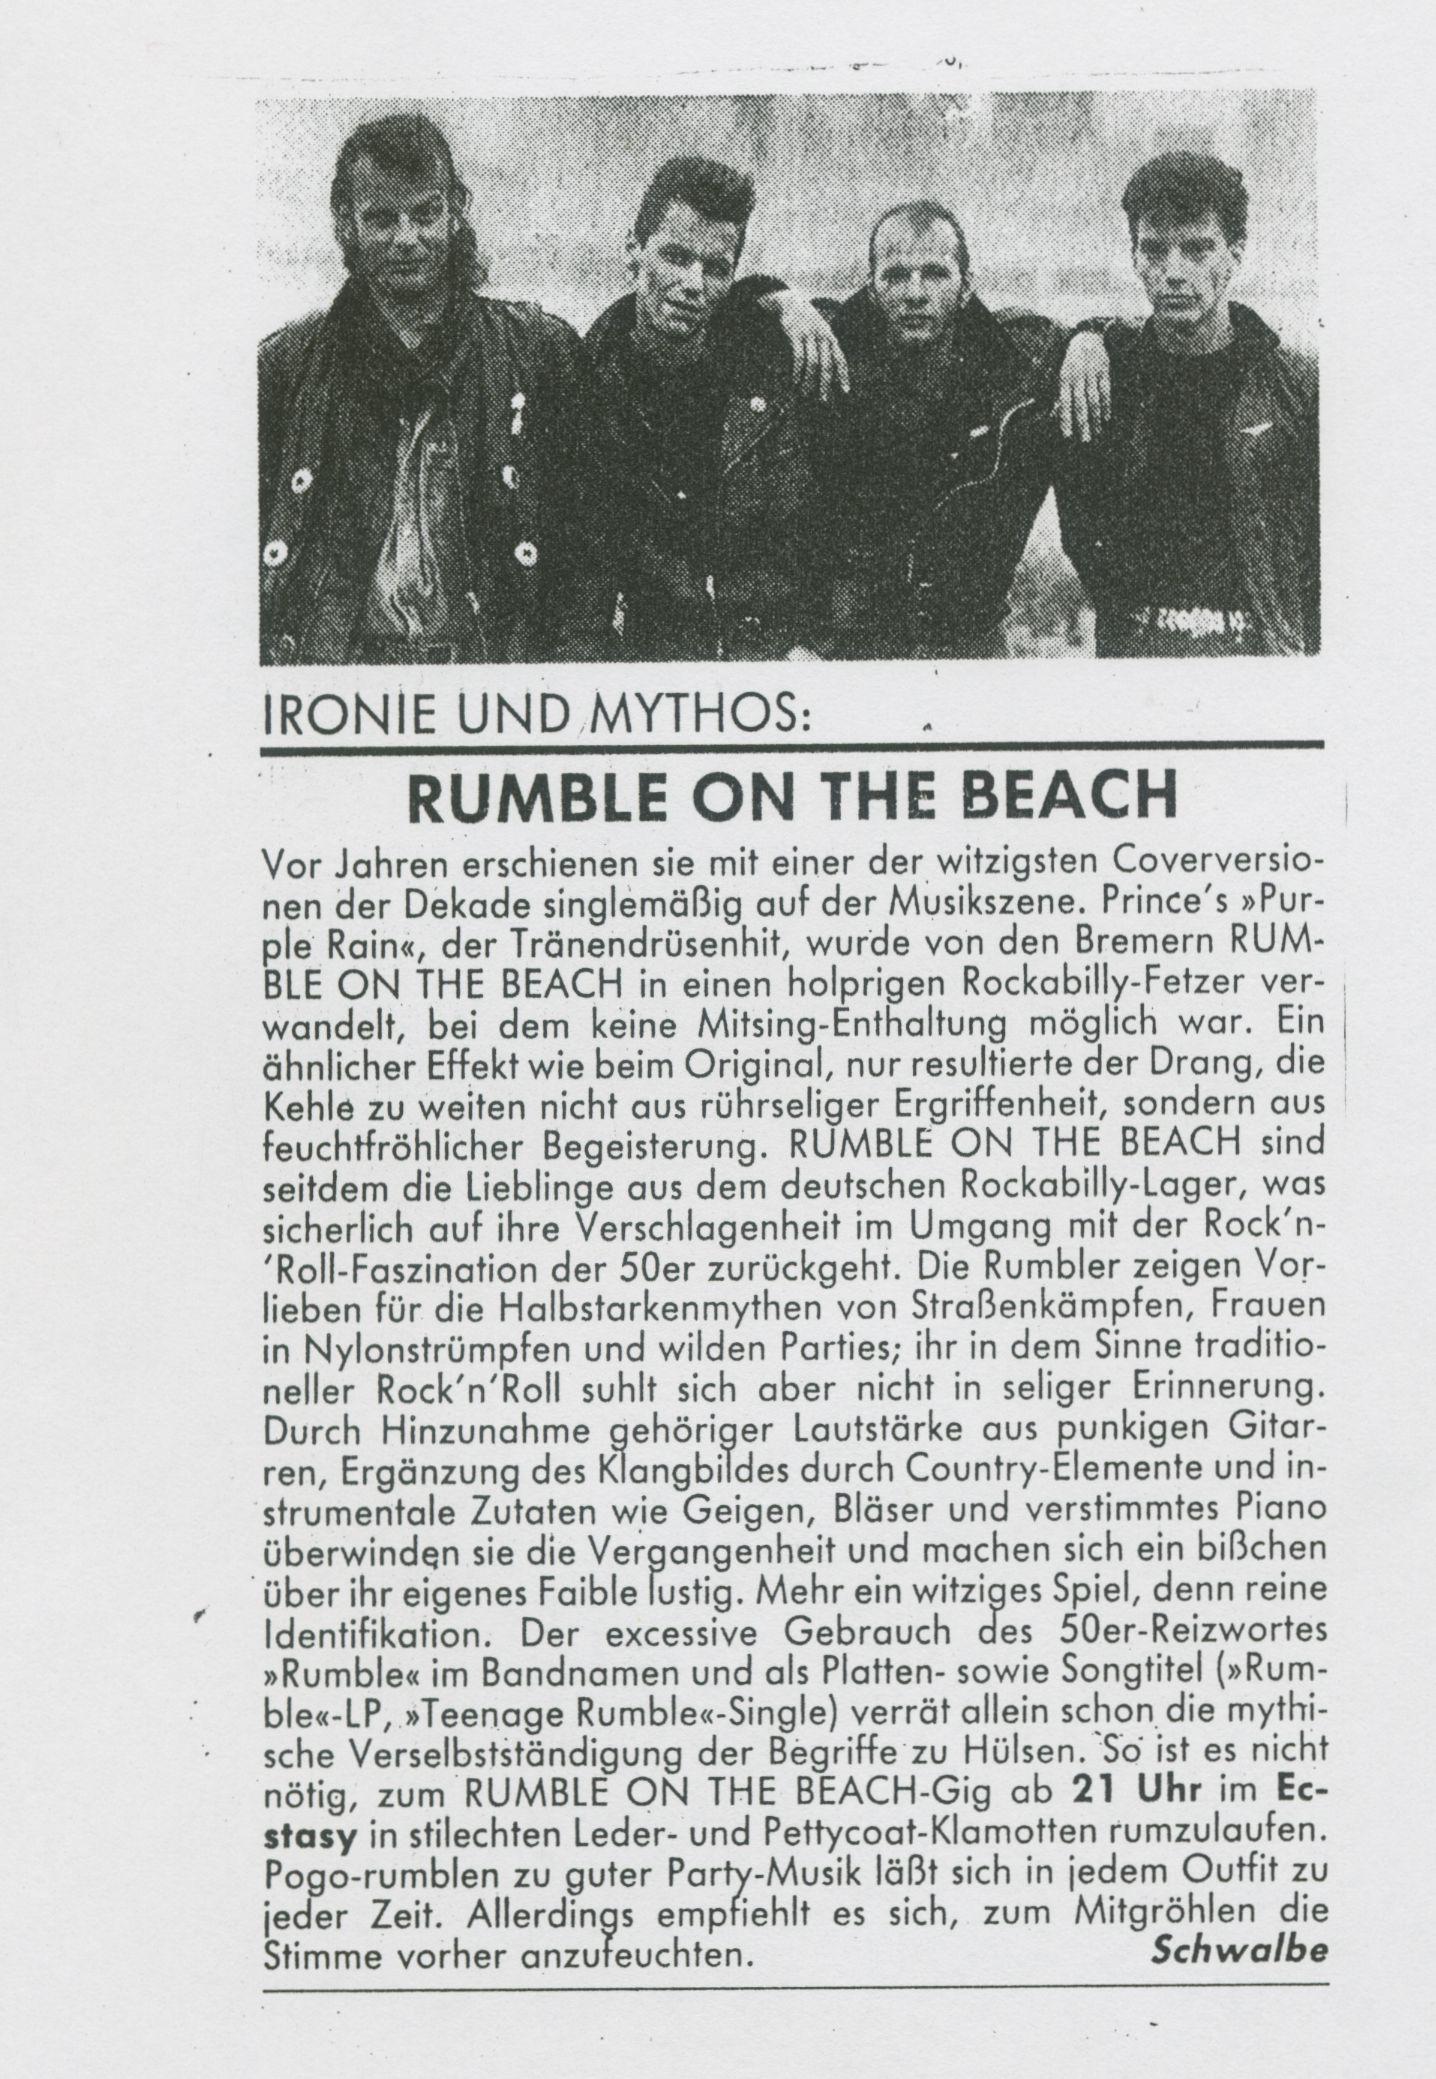 IRONIE UND MYTHOS: RUMBLE ON THE BEACH